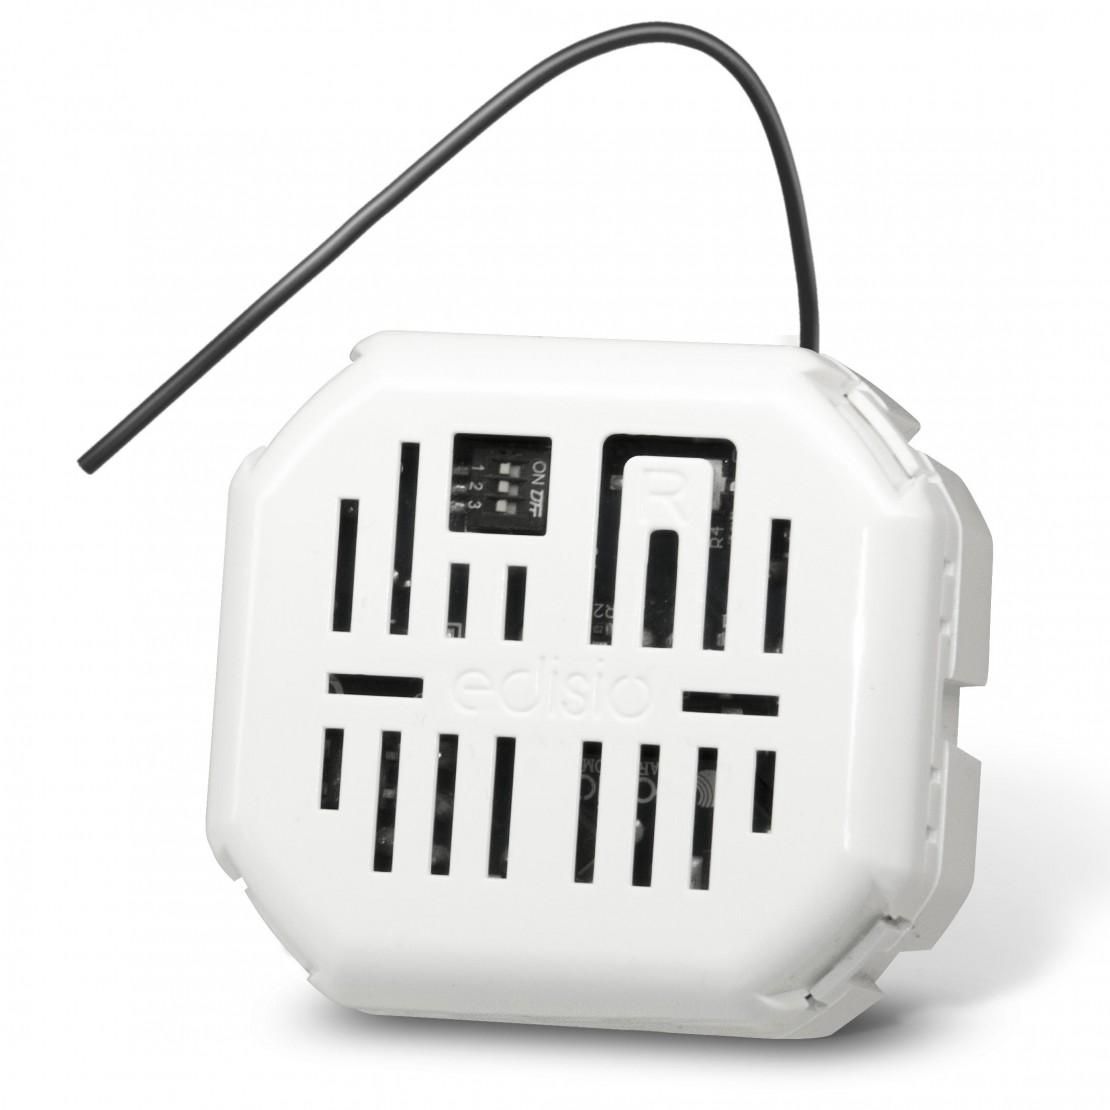 Dimmer micro-module for lighting